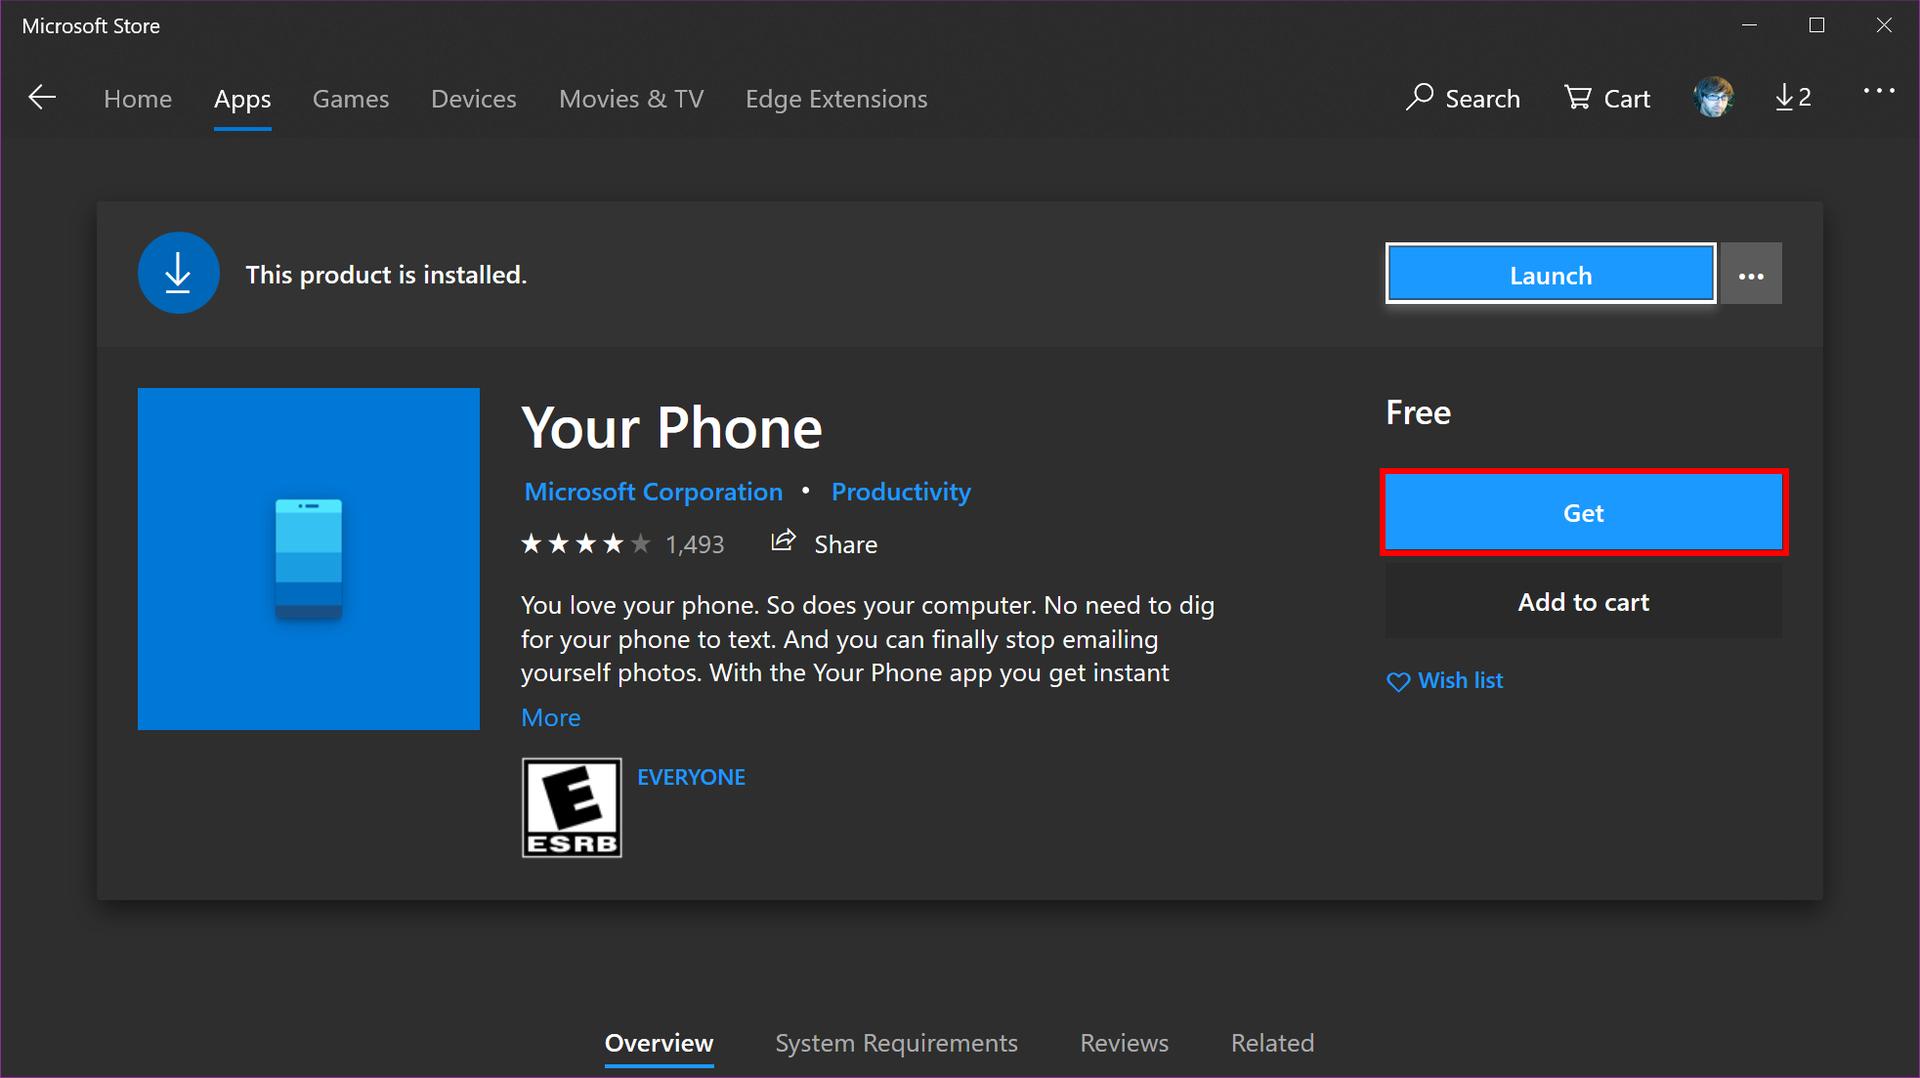 Windows 10 Get Your Phone App